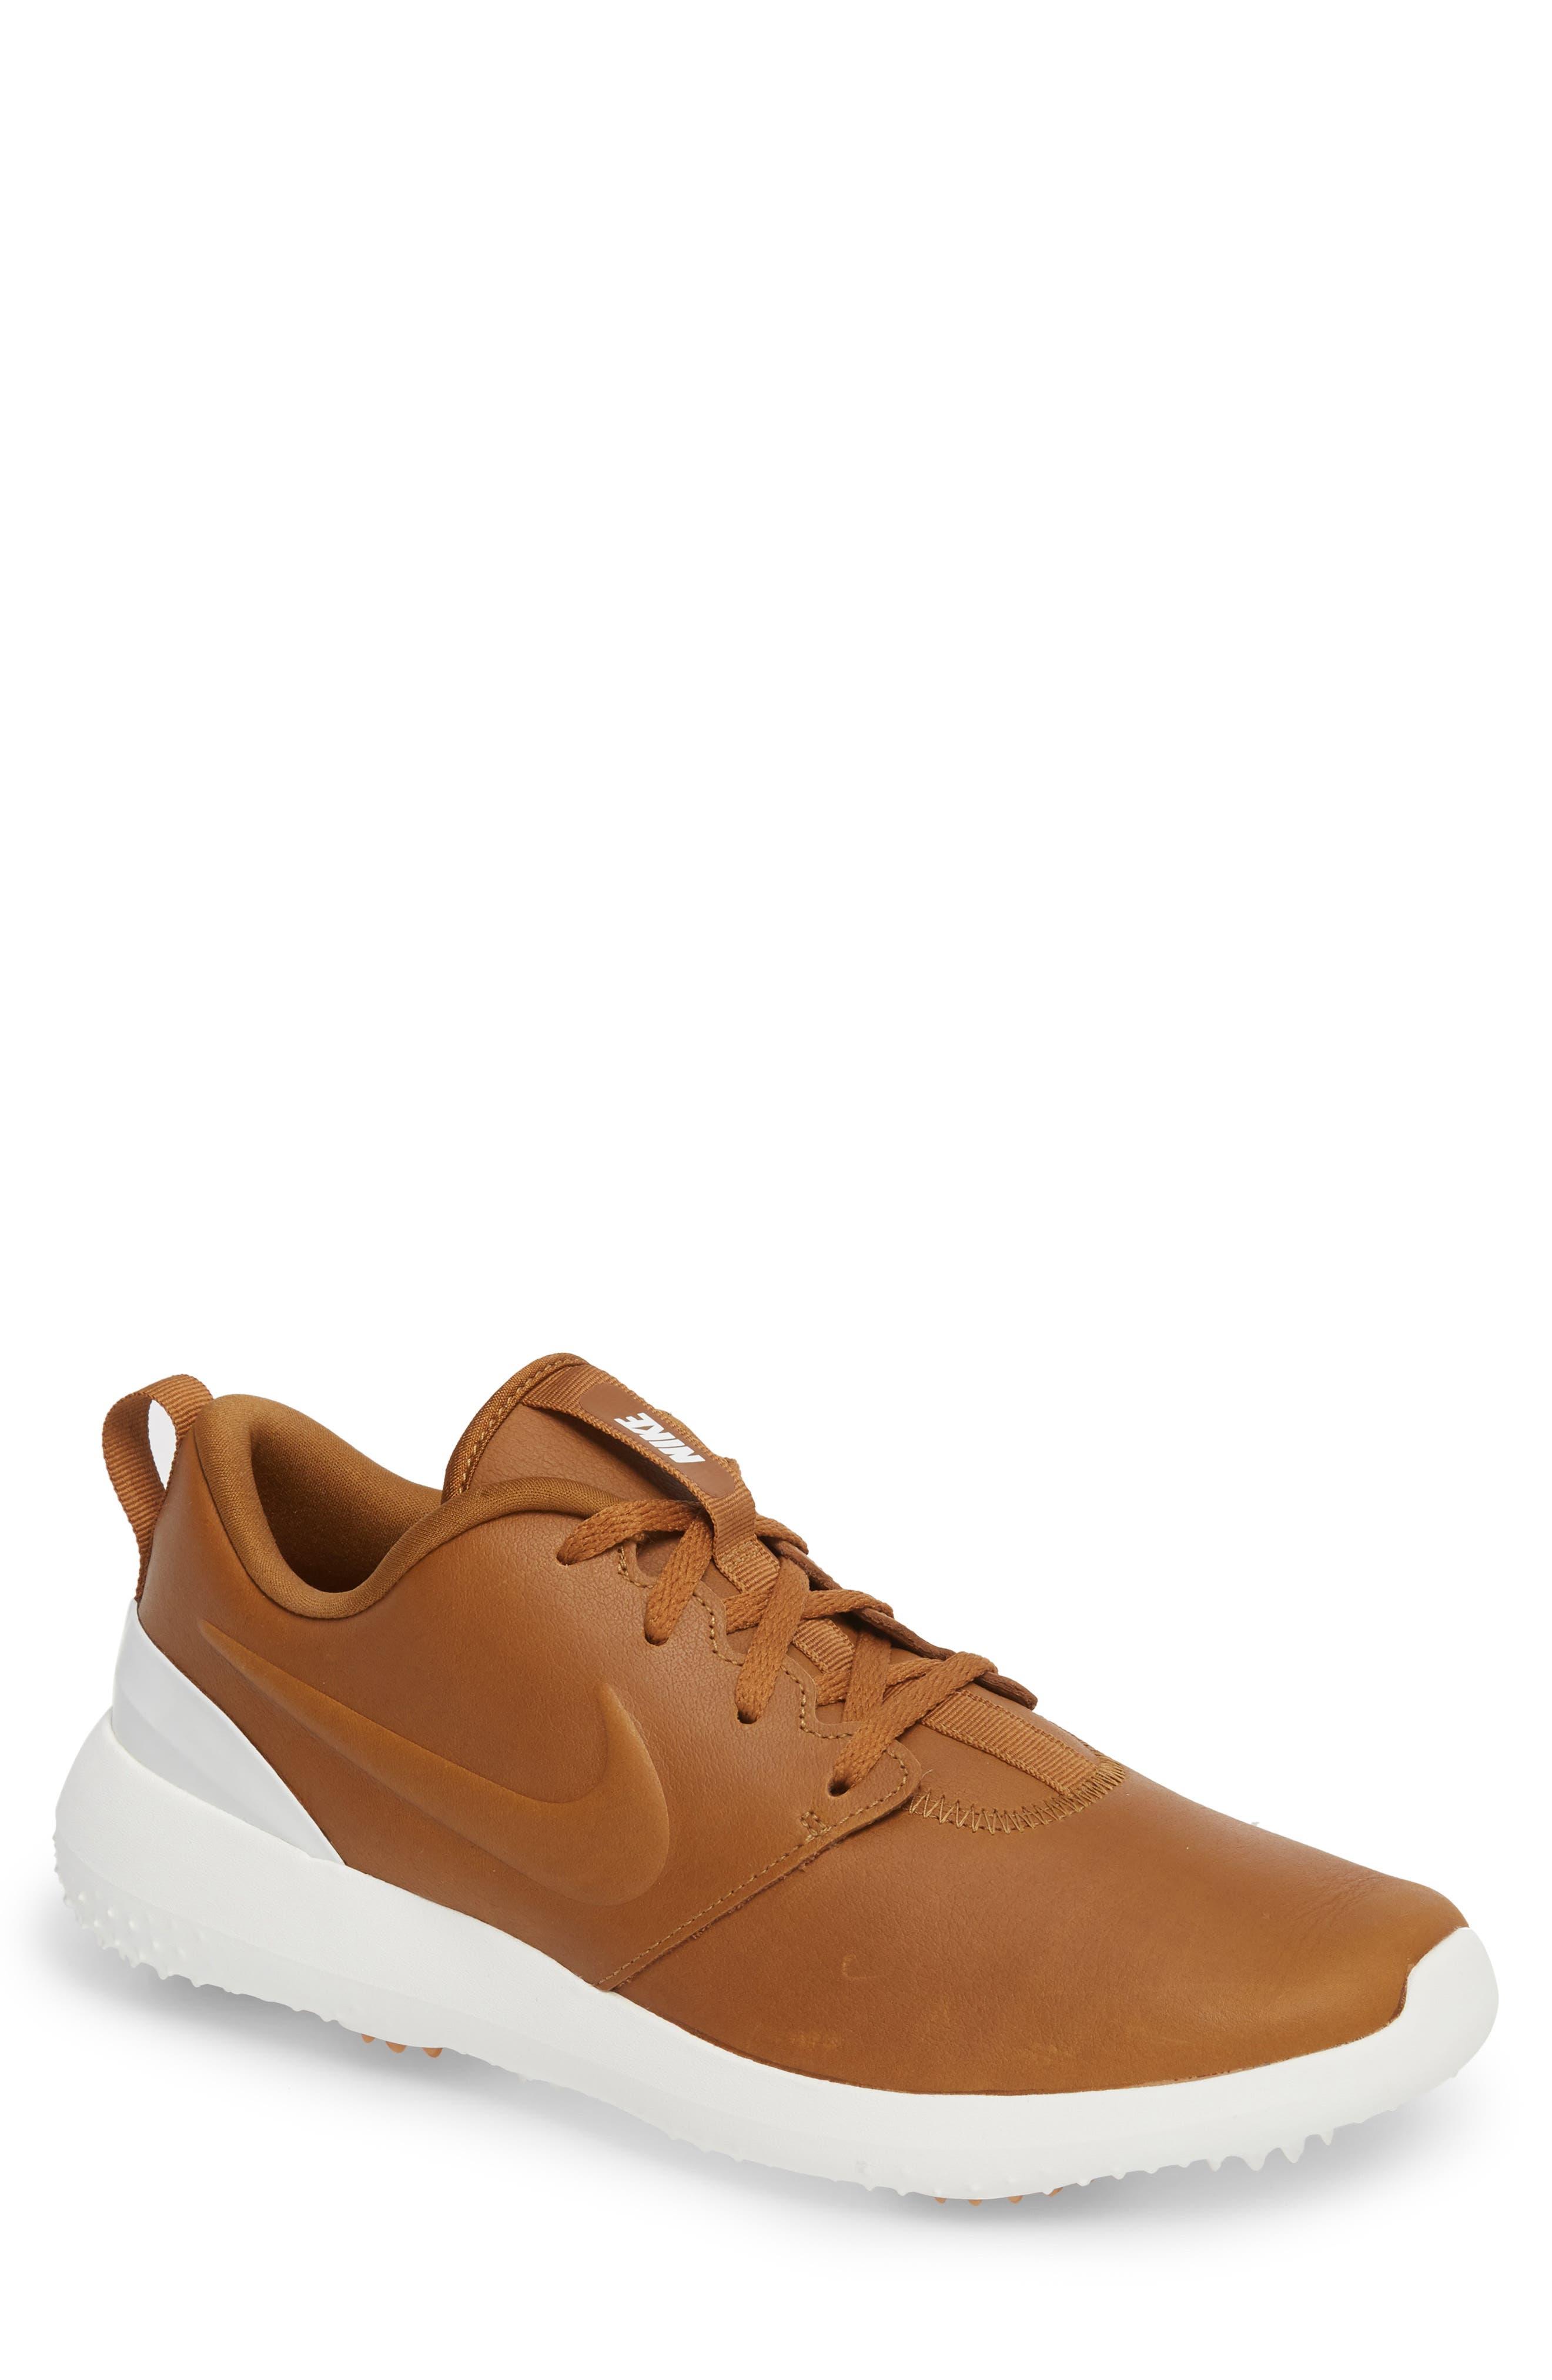 Roshe G Premium Golf Shoe,                         Main,                         color, Ale Brown/ Ale Brown-White